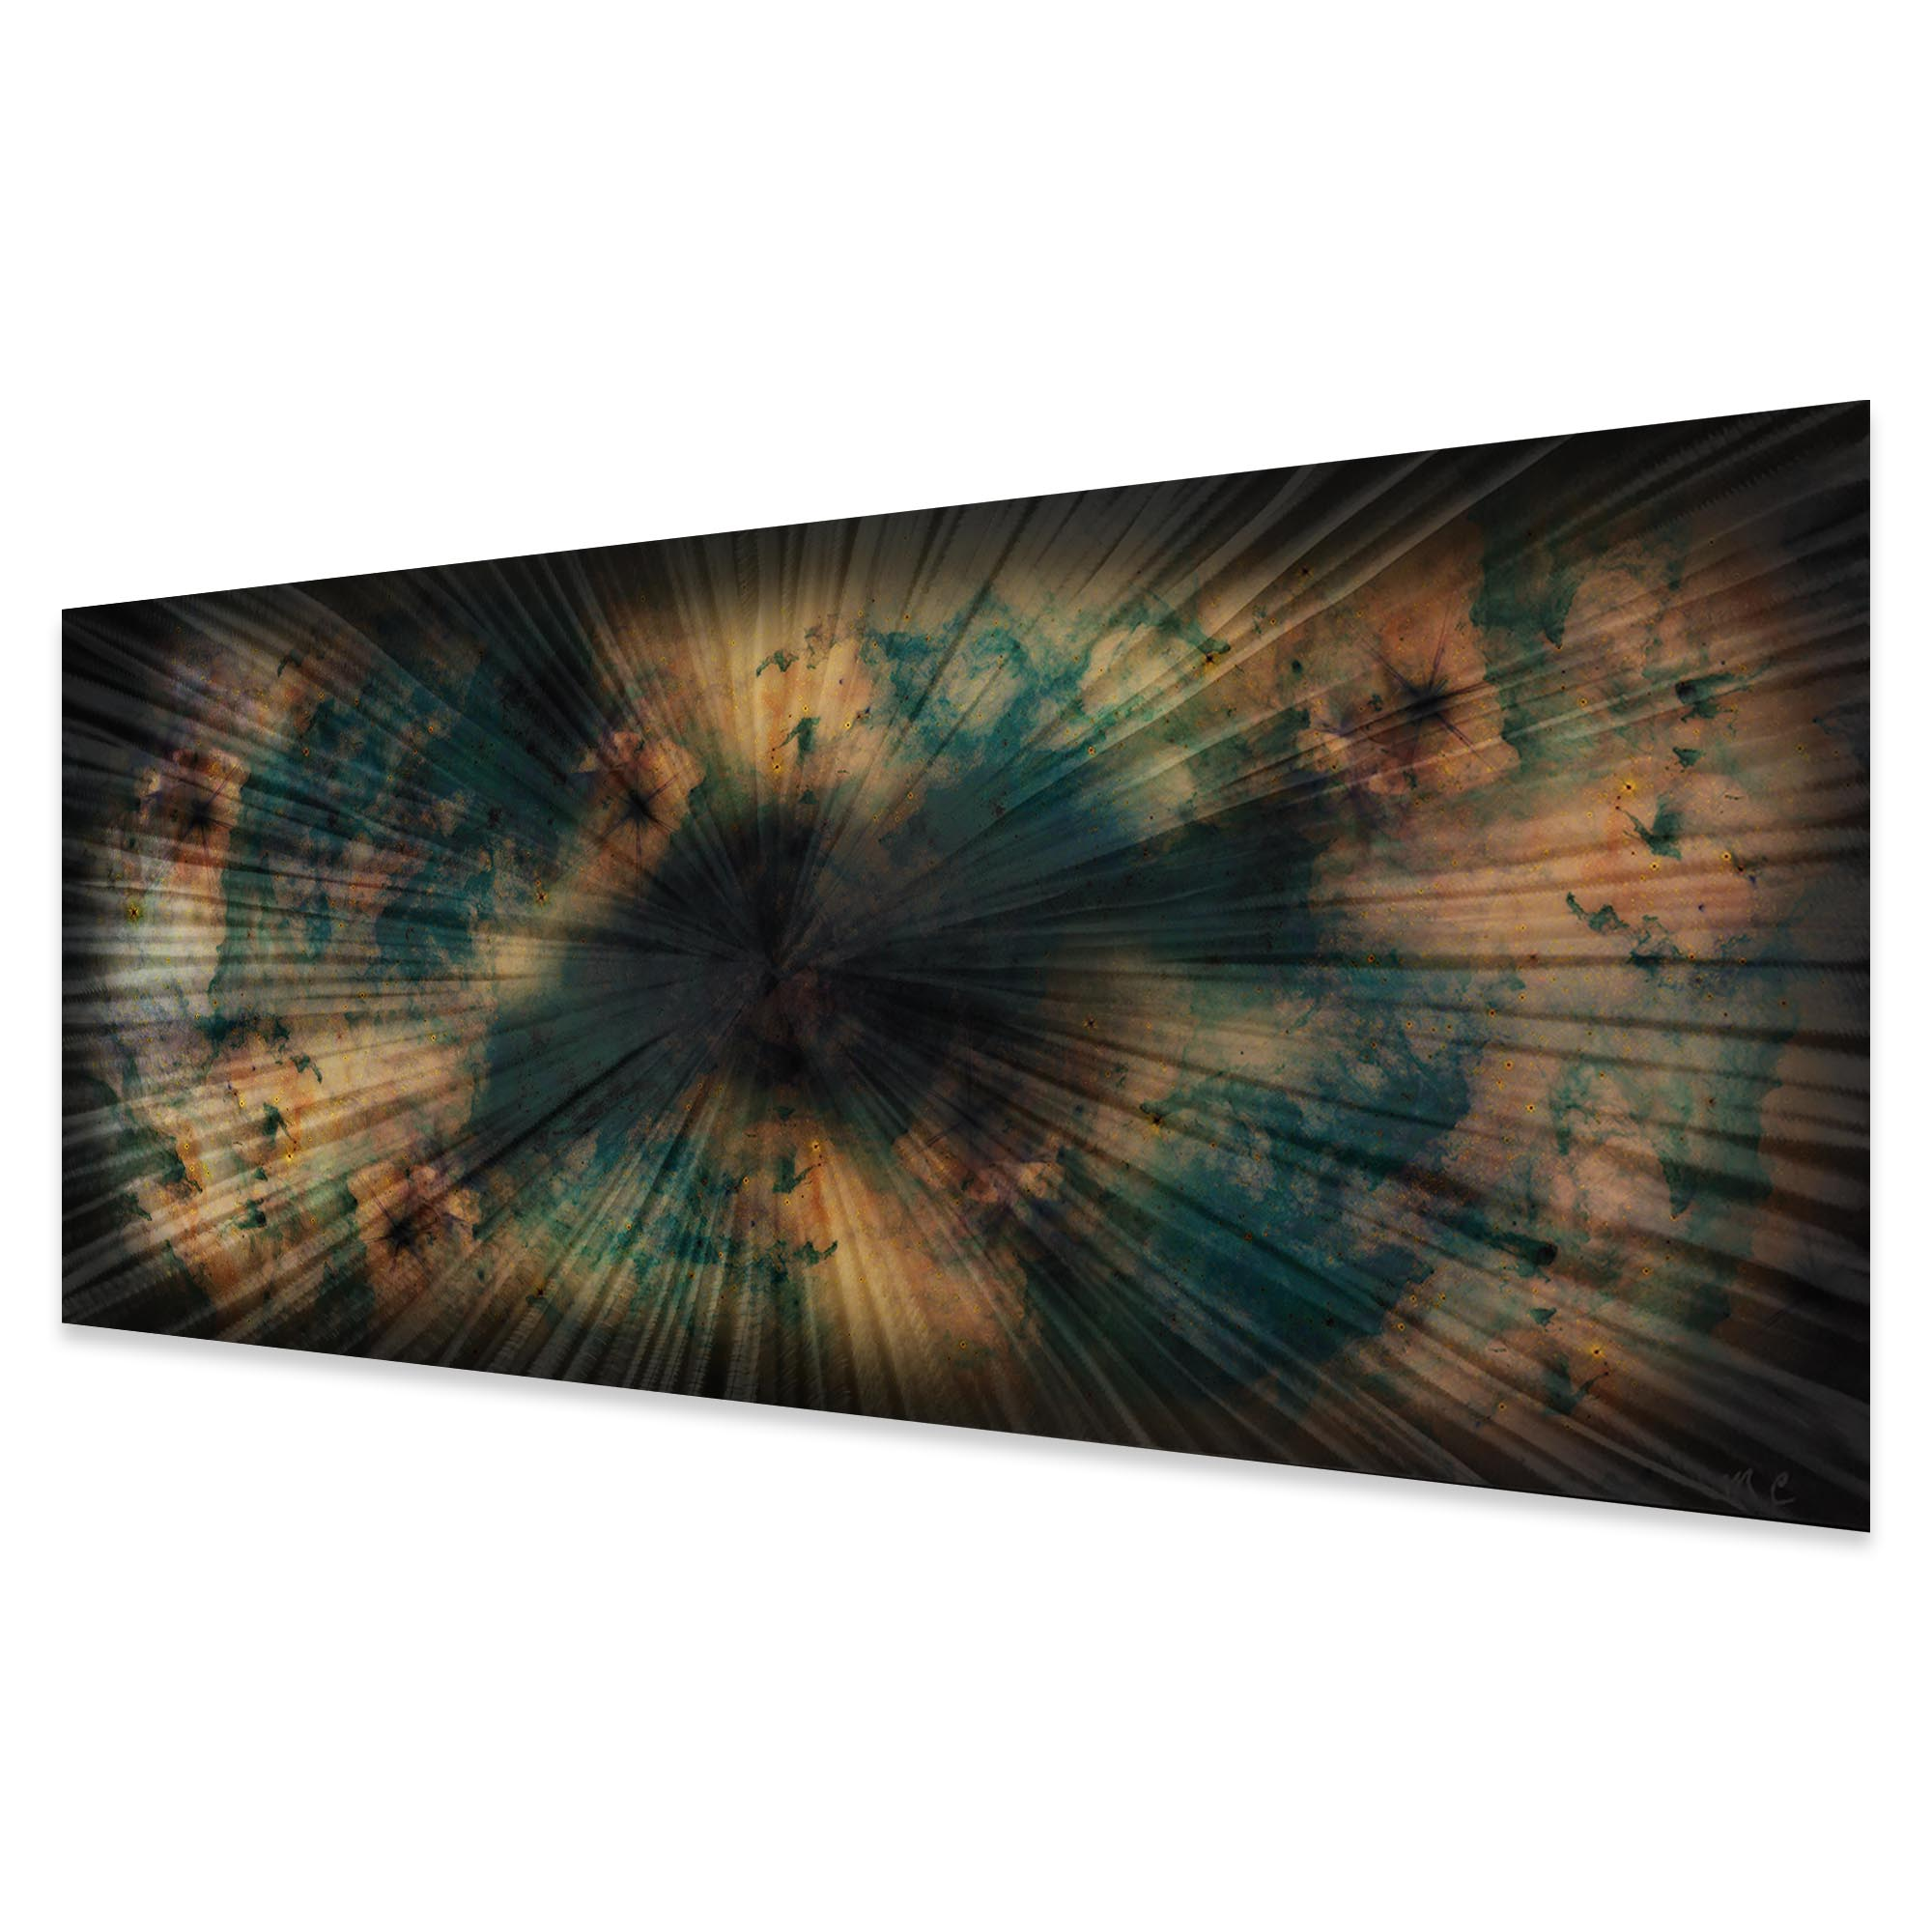 Organic Nebula by Helena Martin - Original Abstract Art on Ground and Colored Metal - Image 2